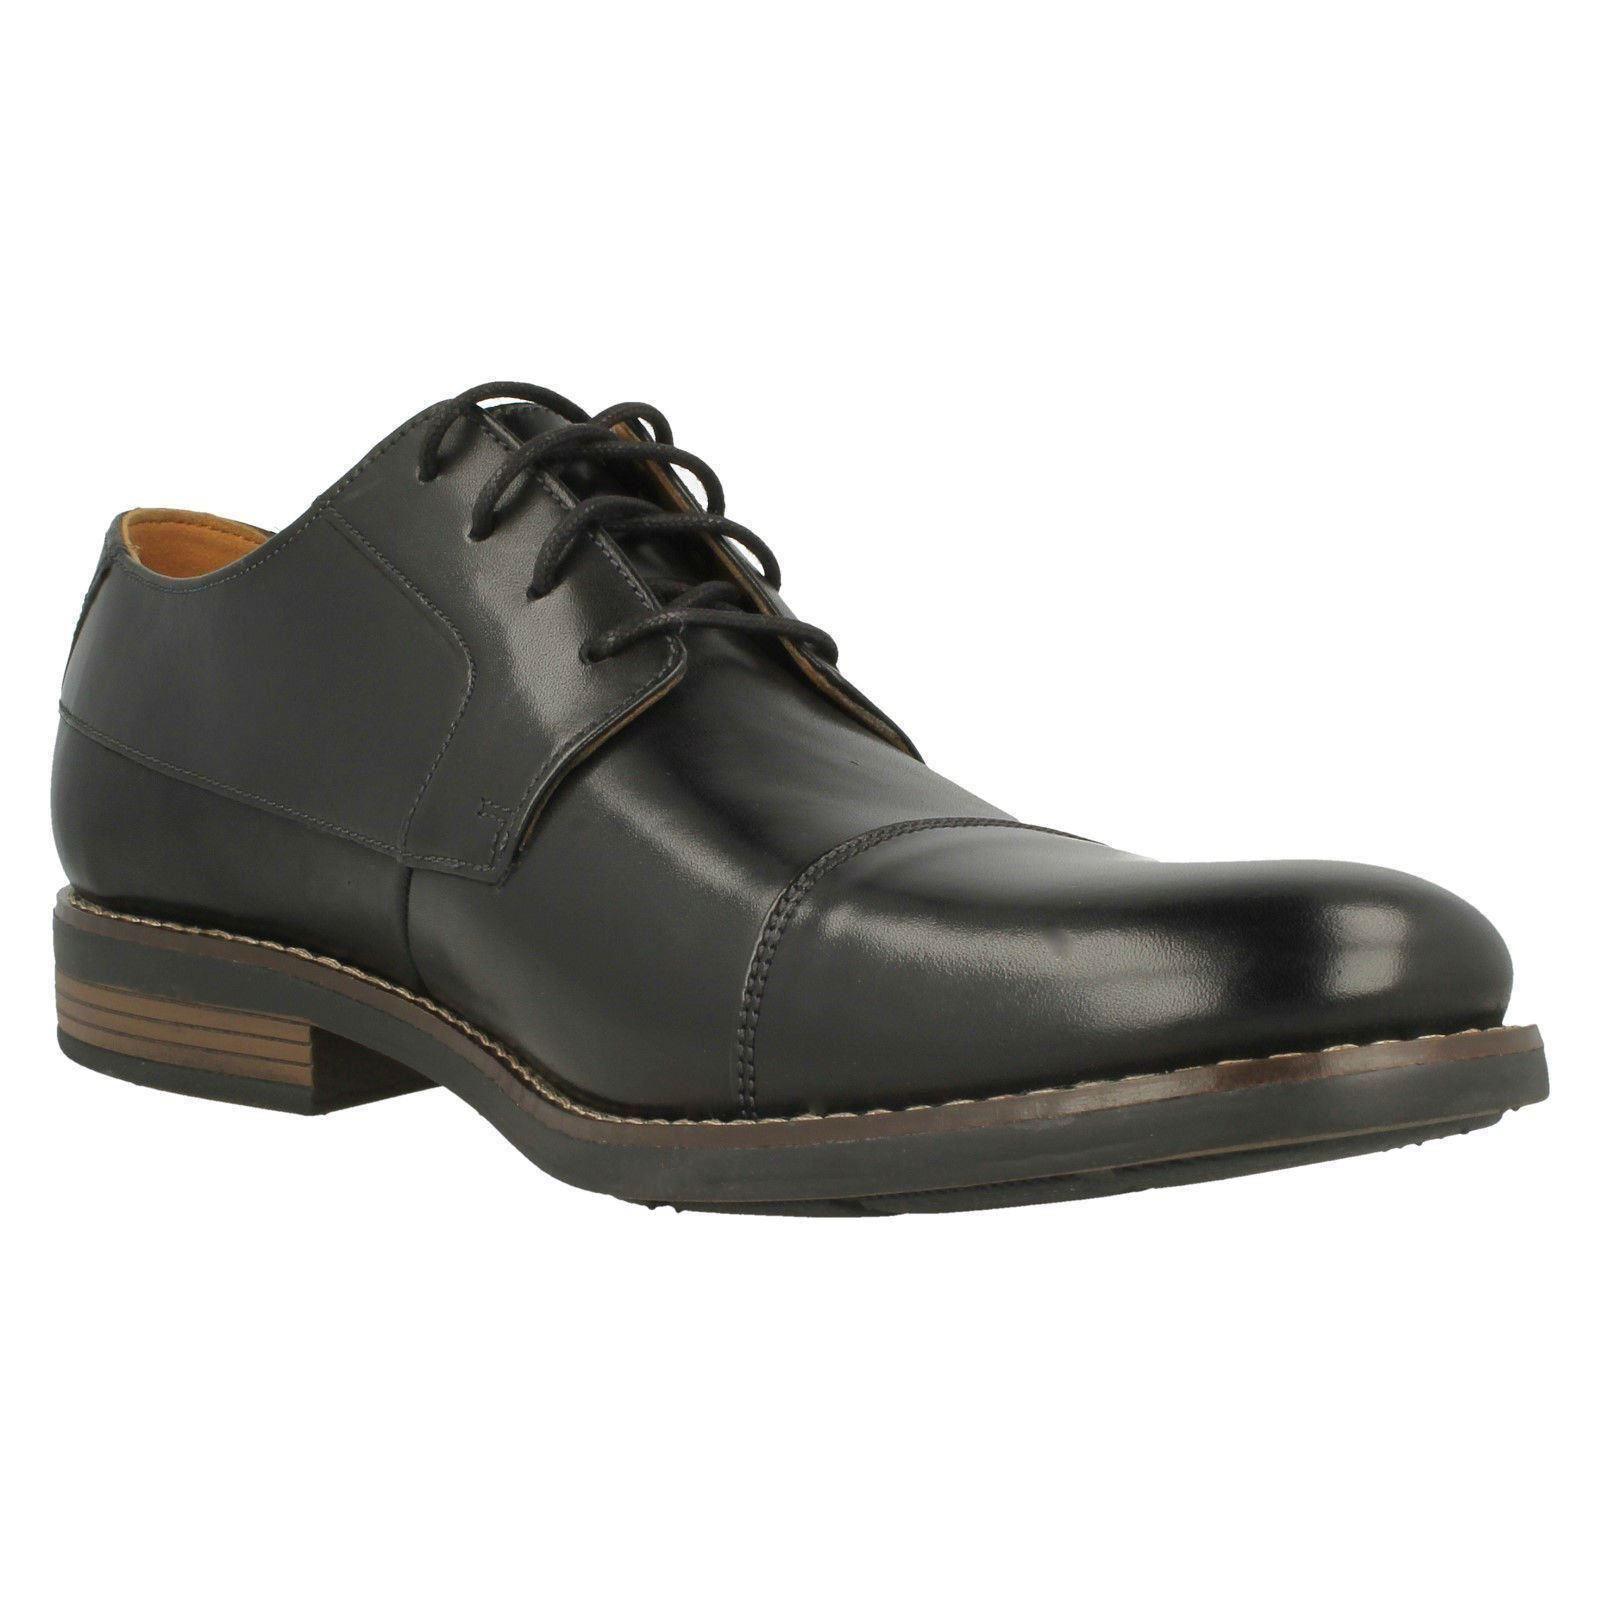 Uomo Clarks Schuhes Lace Up Leder Smart Toe Cap Schuhes Clarks Becken Cap 22c2af